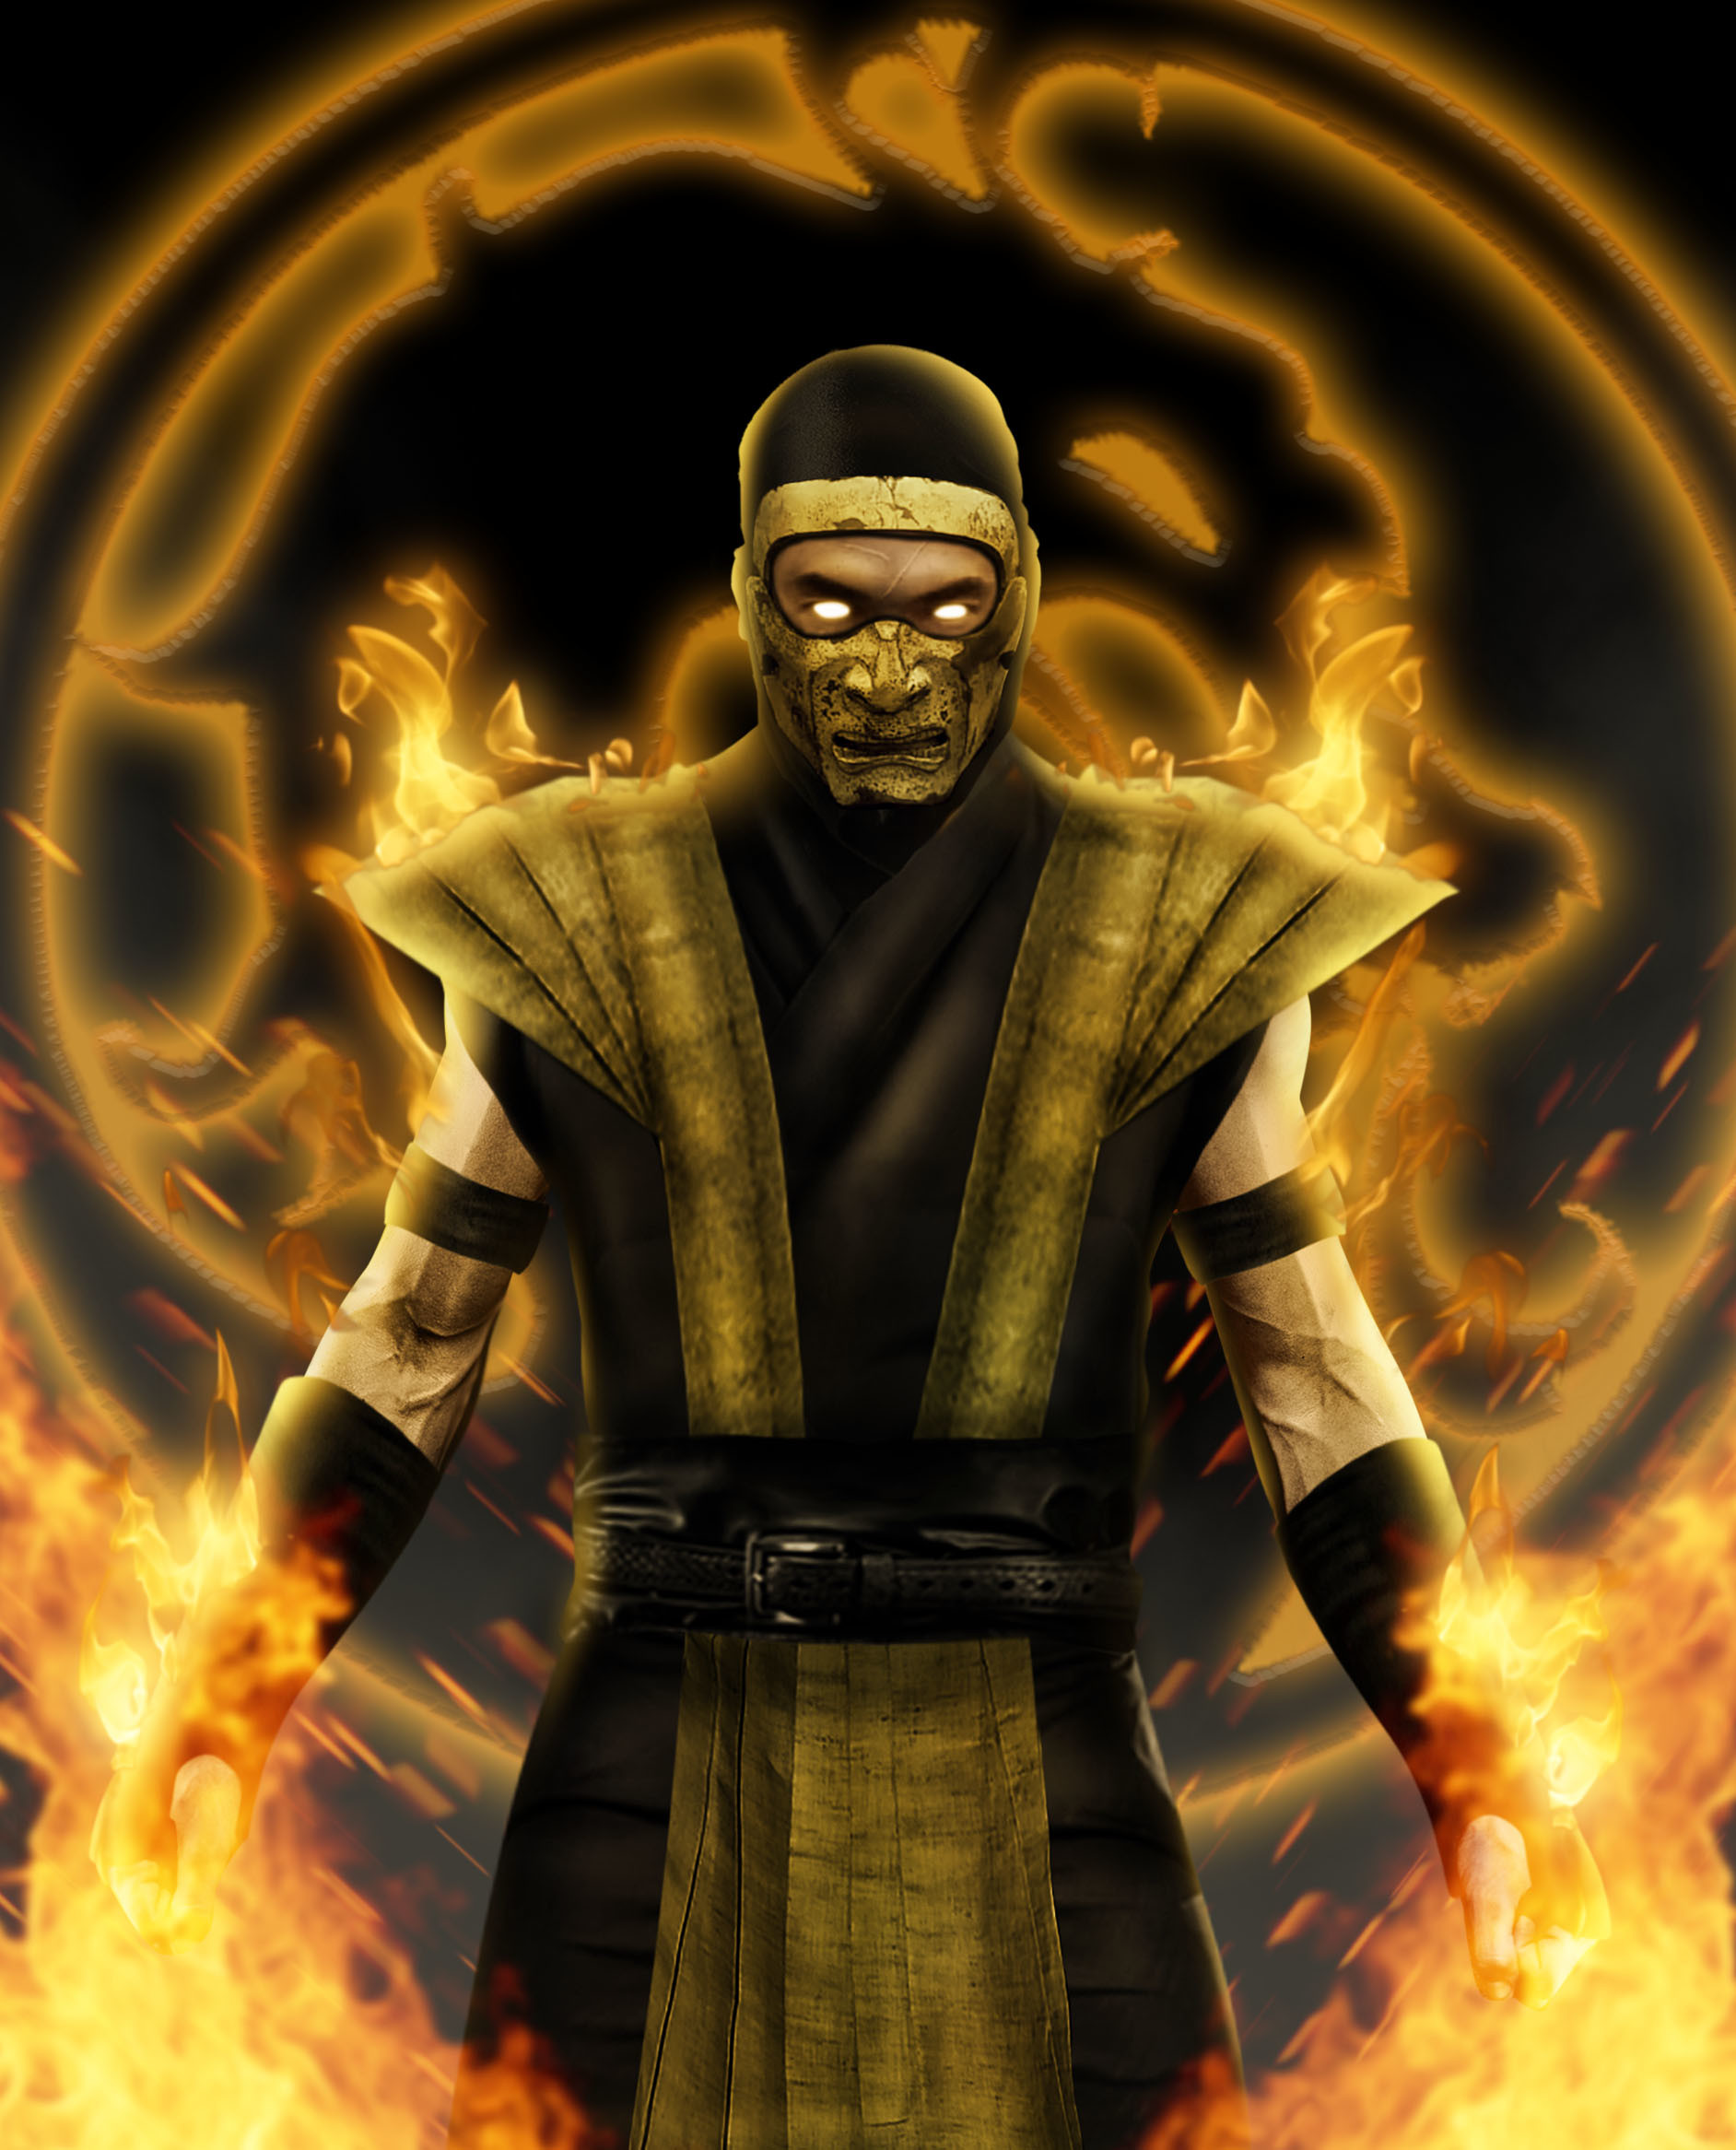 Artstation Hyper Realistic Mortal Kombat Richard Jaime